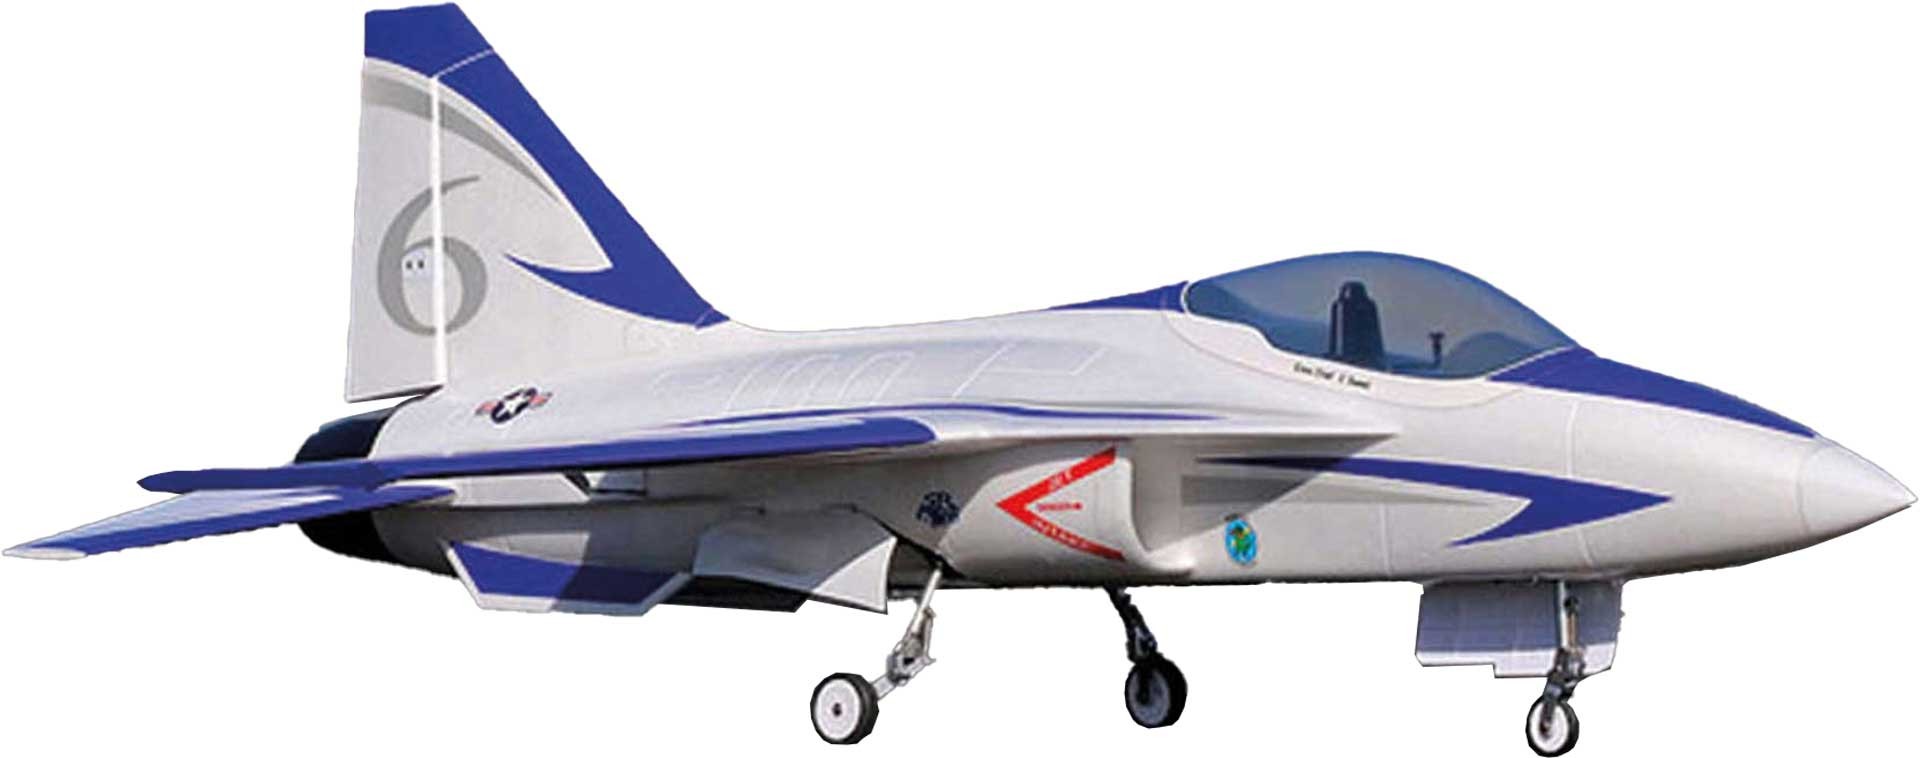 PREMIER AIRCRAFT FLEXJET 90MM EDF IMPELLER JET SUPER PNP BLUE WITH AURA 8 AFCS